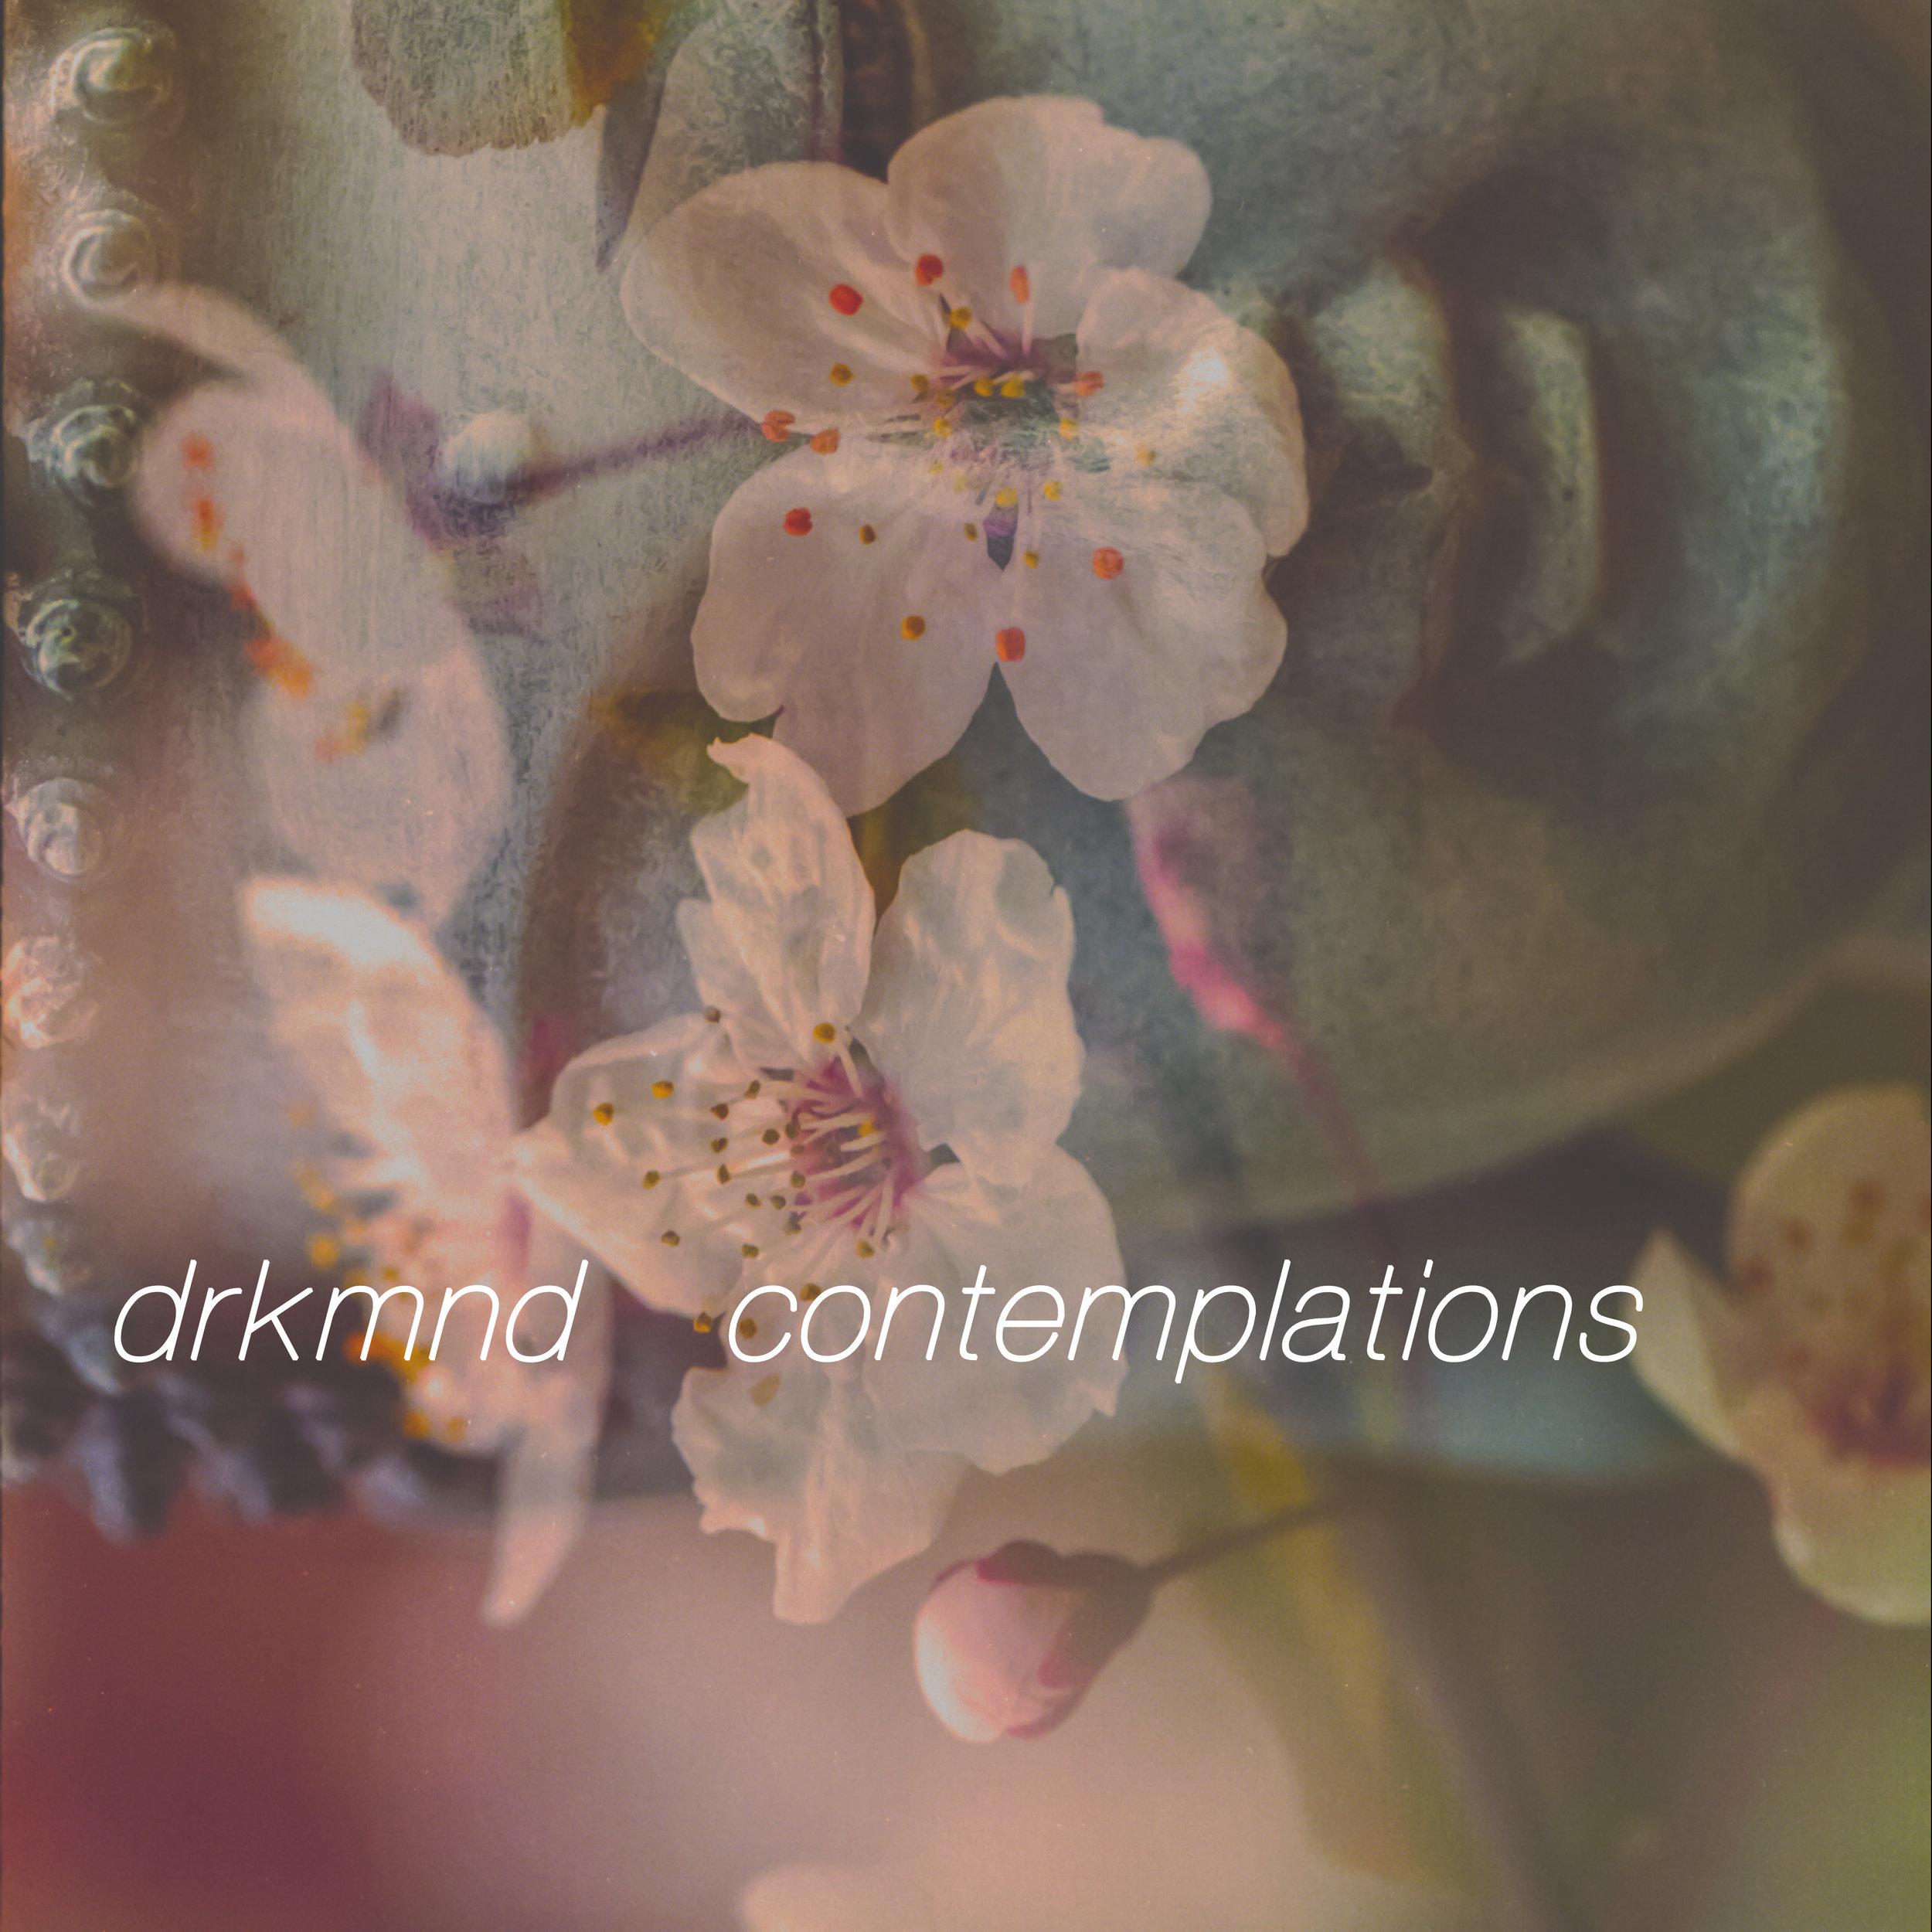 contemplations_1_cover_no_tag.jpg